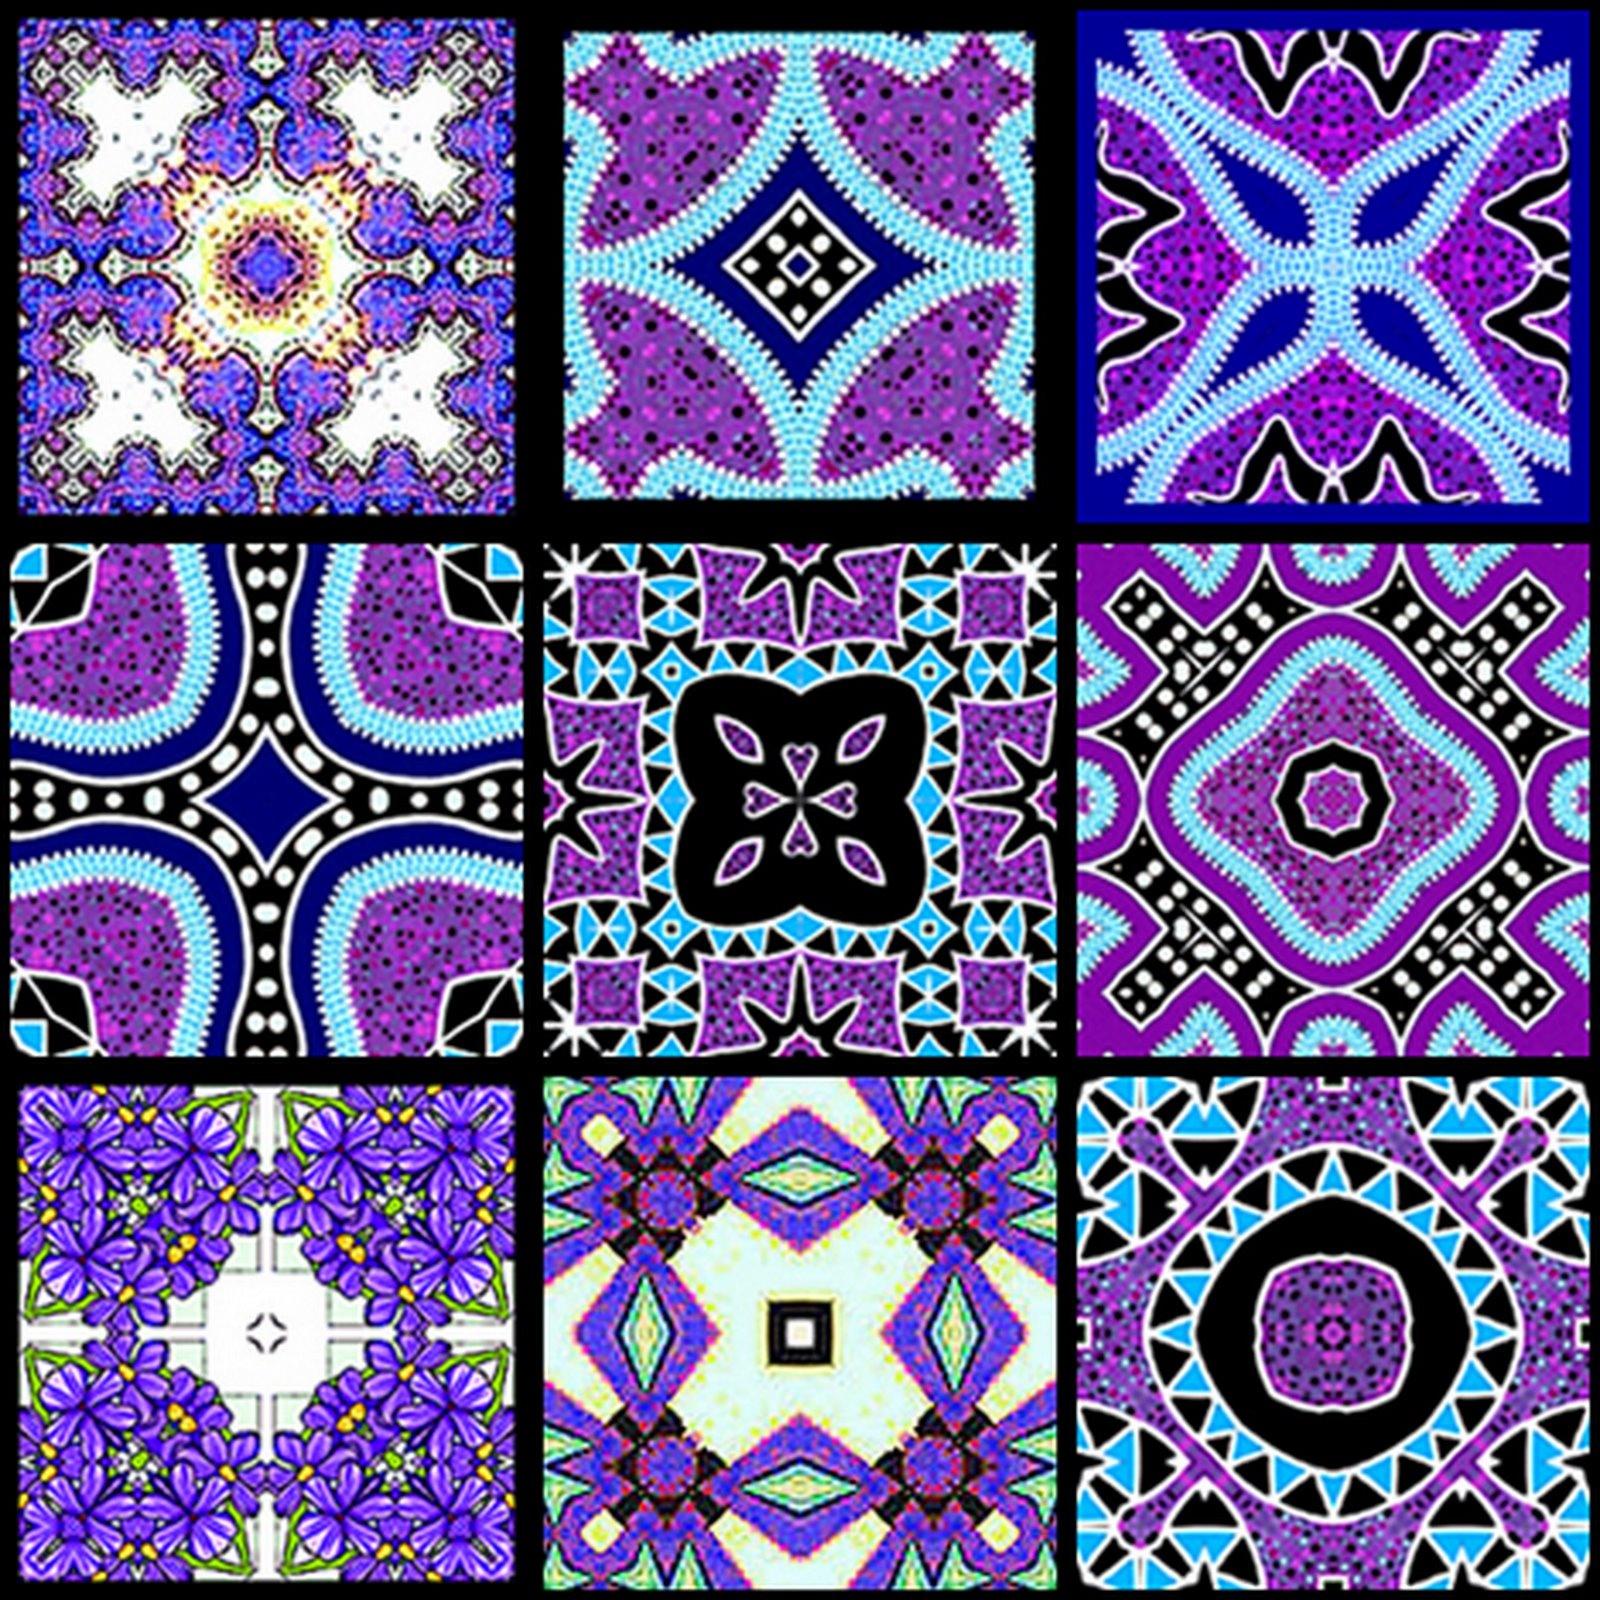 Artbyjean - Tea Bag Tiles: Block Of Nine Tea Bag Tiles - Purple - Free Printable Tea Bag Folding Patterns